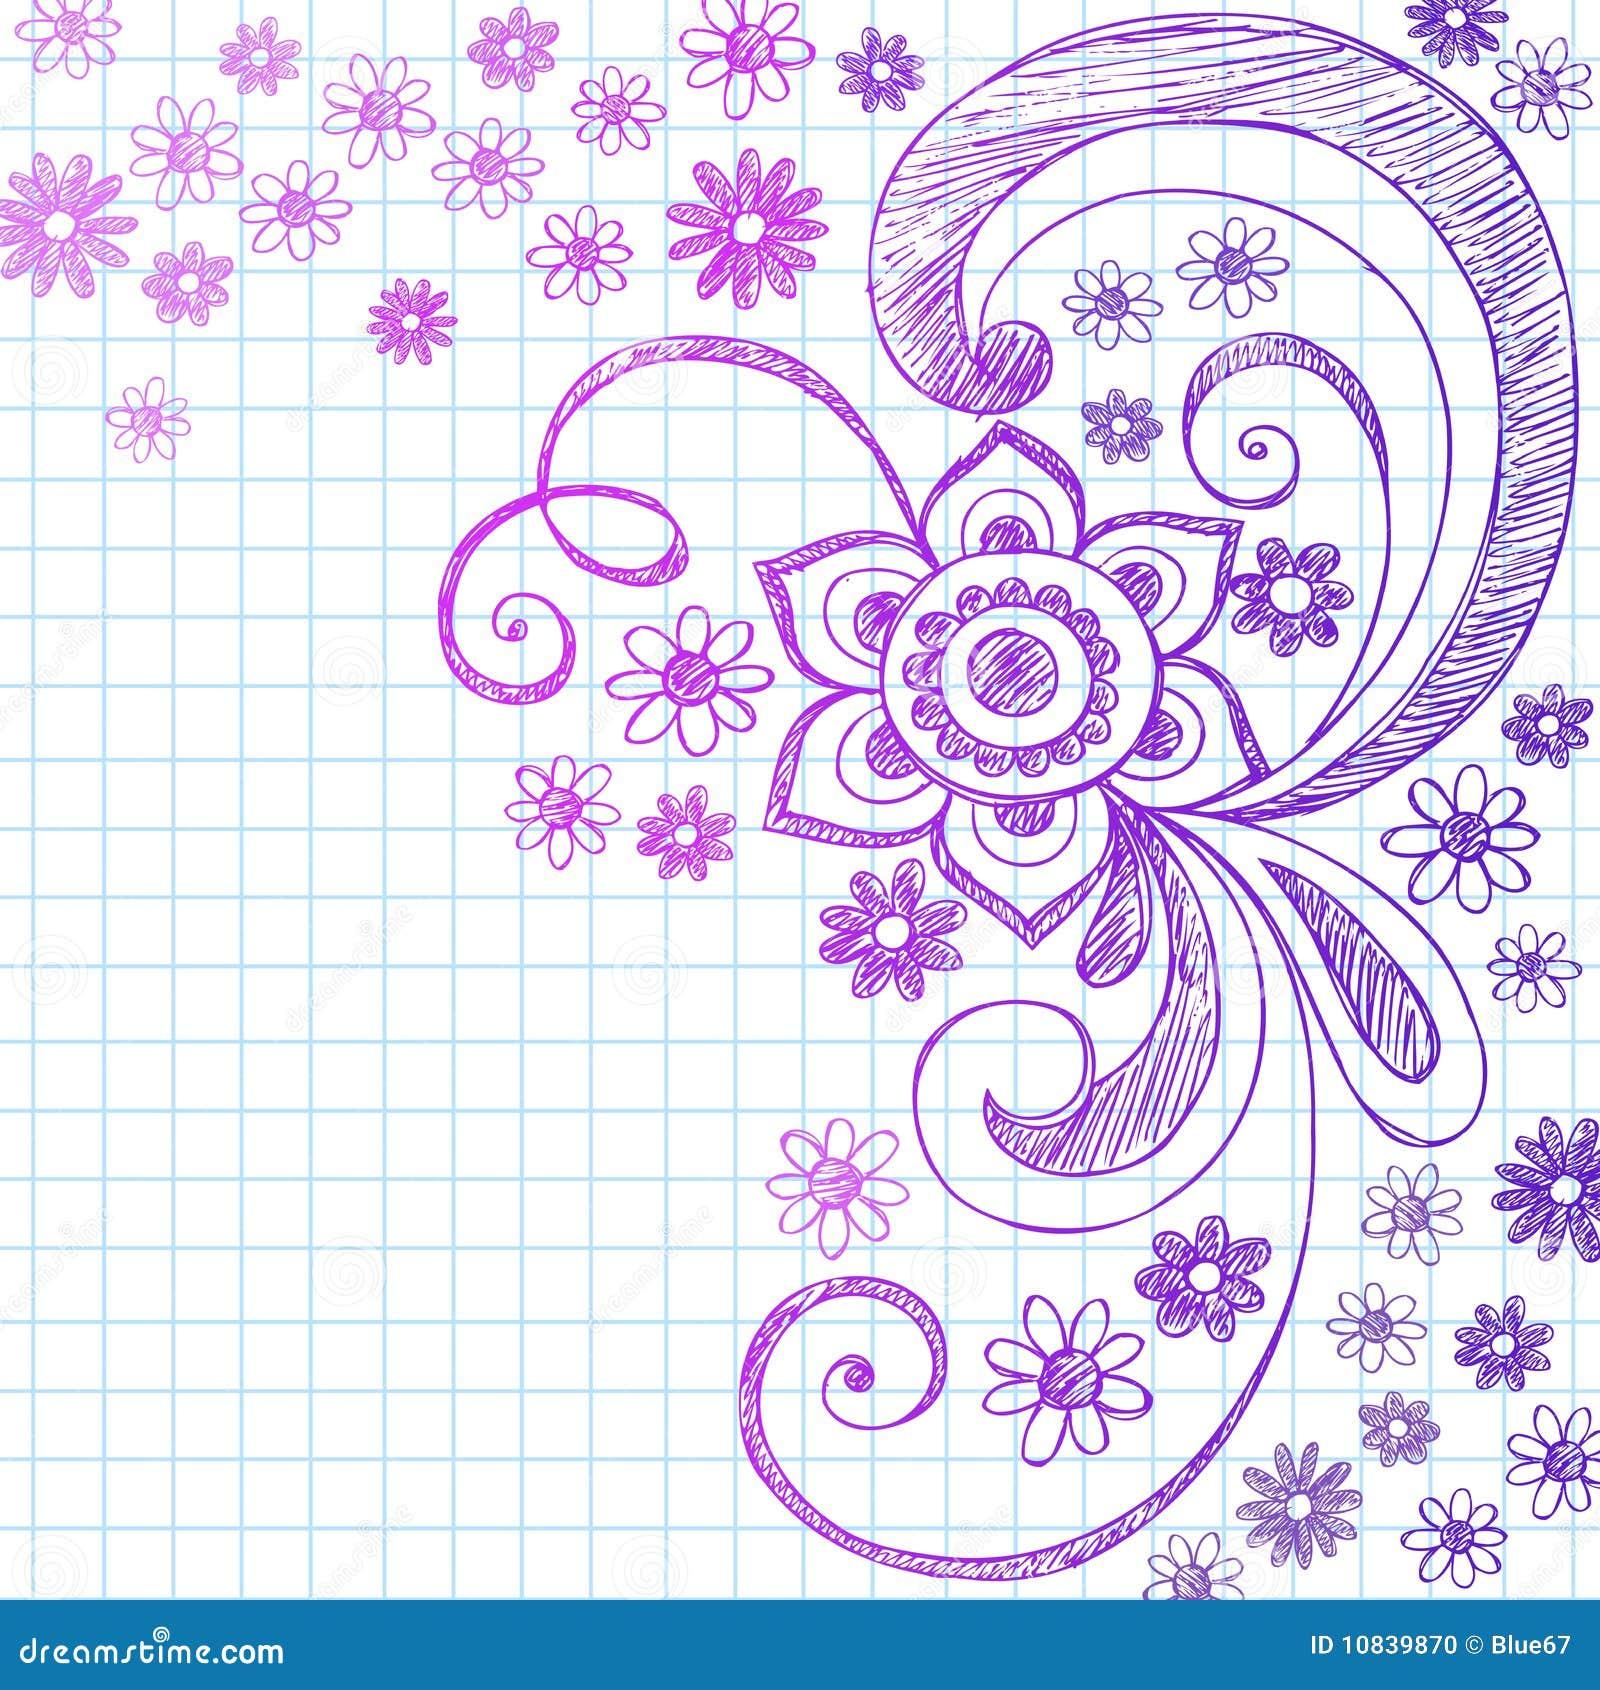 Sketchy flower doodles on notebook paper vector stock for Decoraciones para hojas